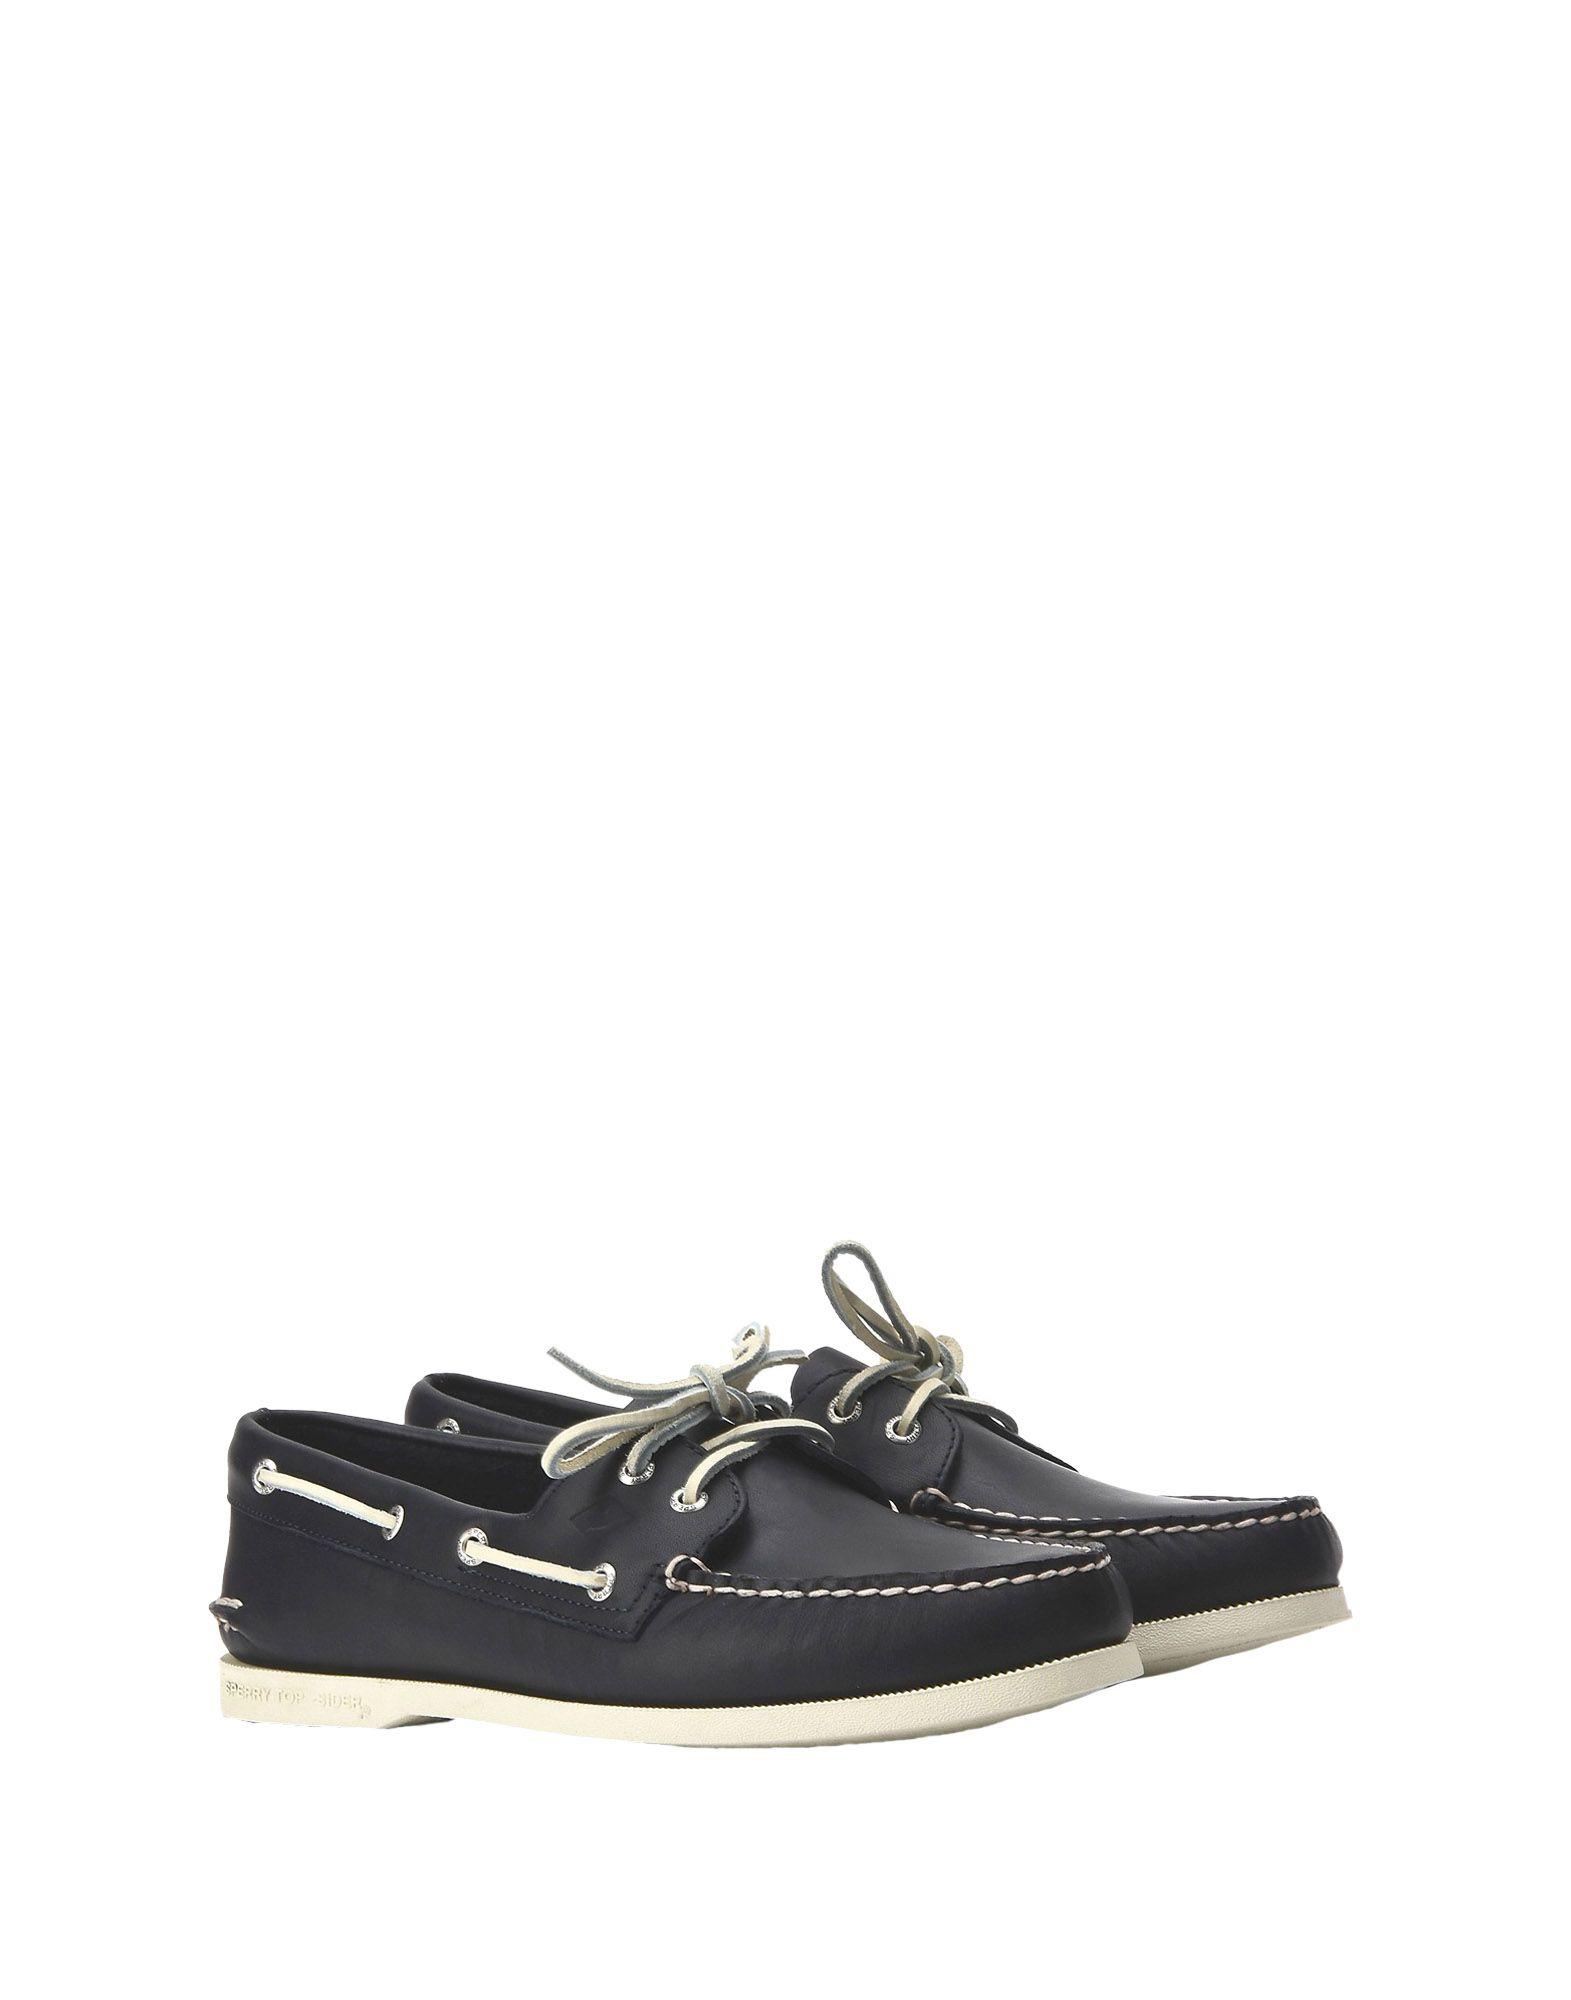 Sperry Top 11221139SL Gute Qualität beliebte Schuhe